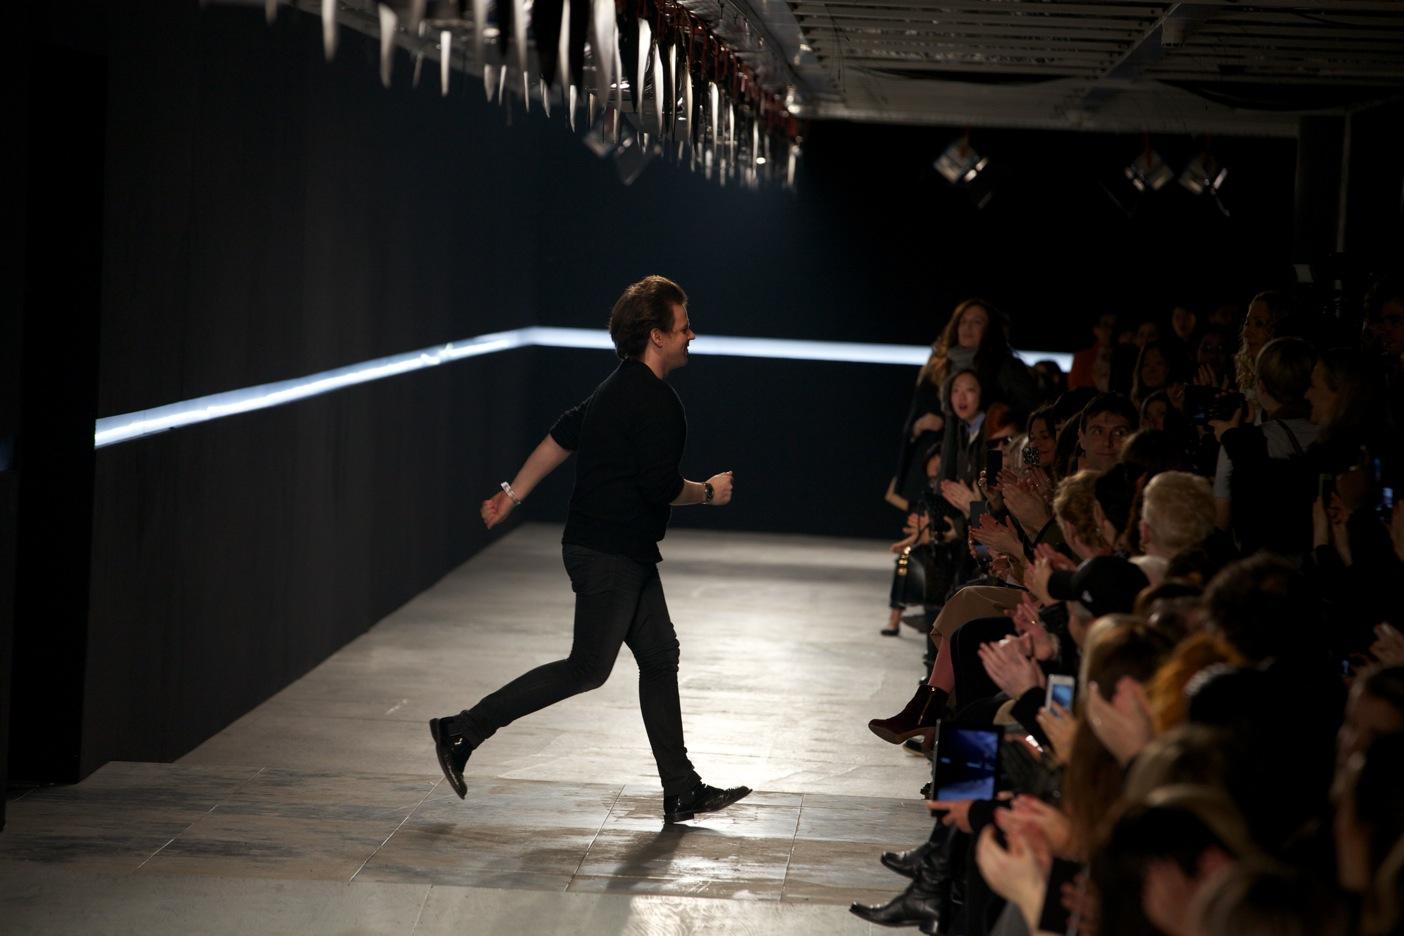 Christopher Kane A-W 2014 (c) Marc aitken 2014  20.jpg